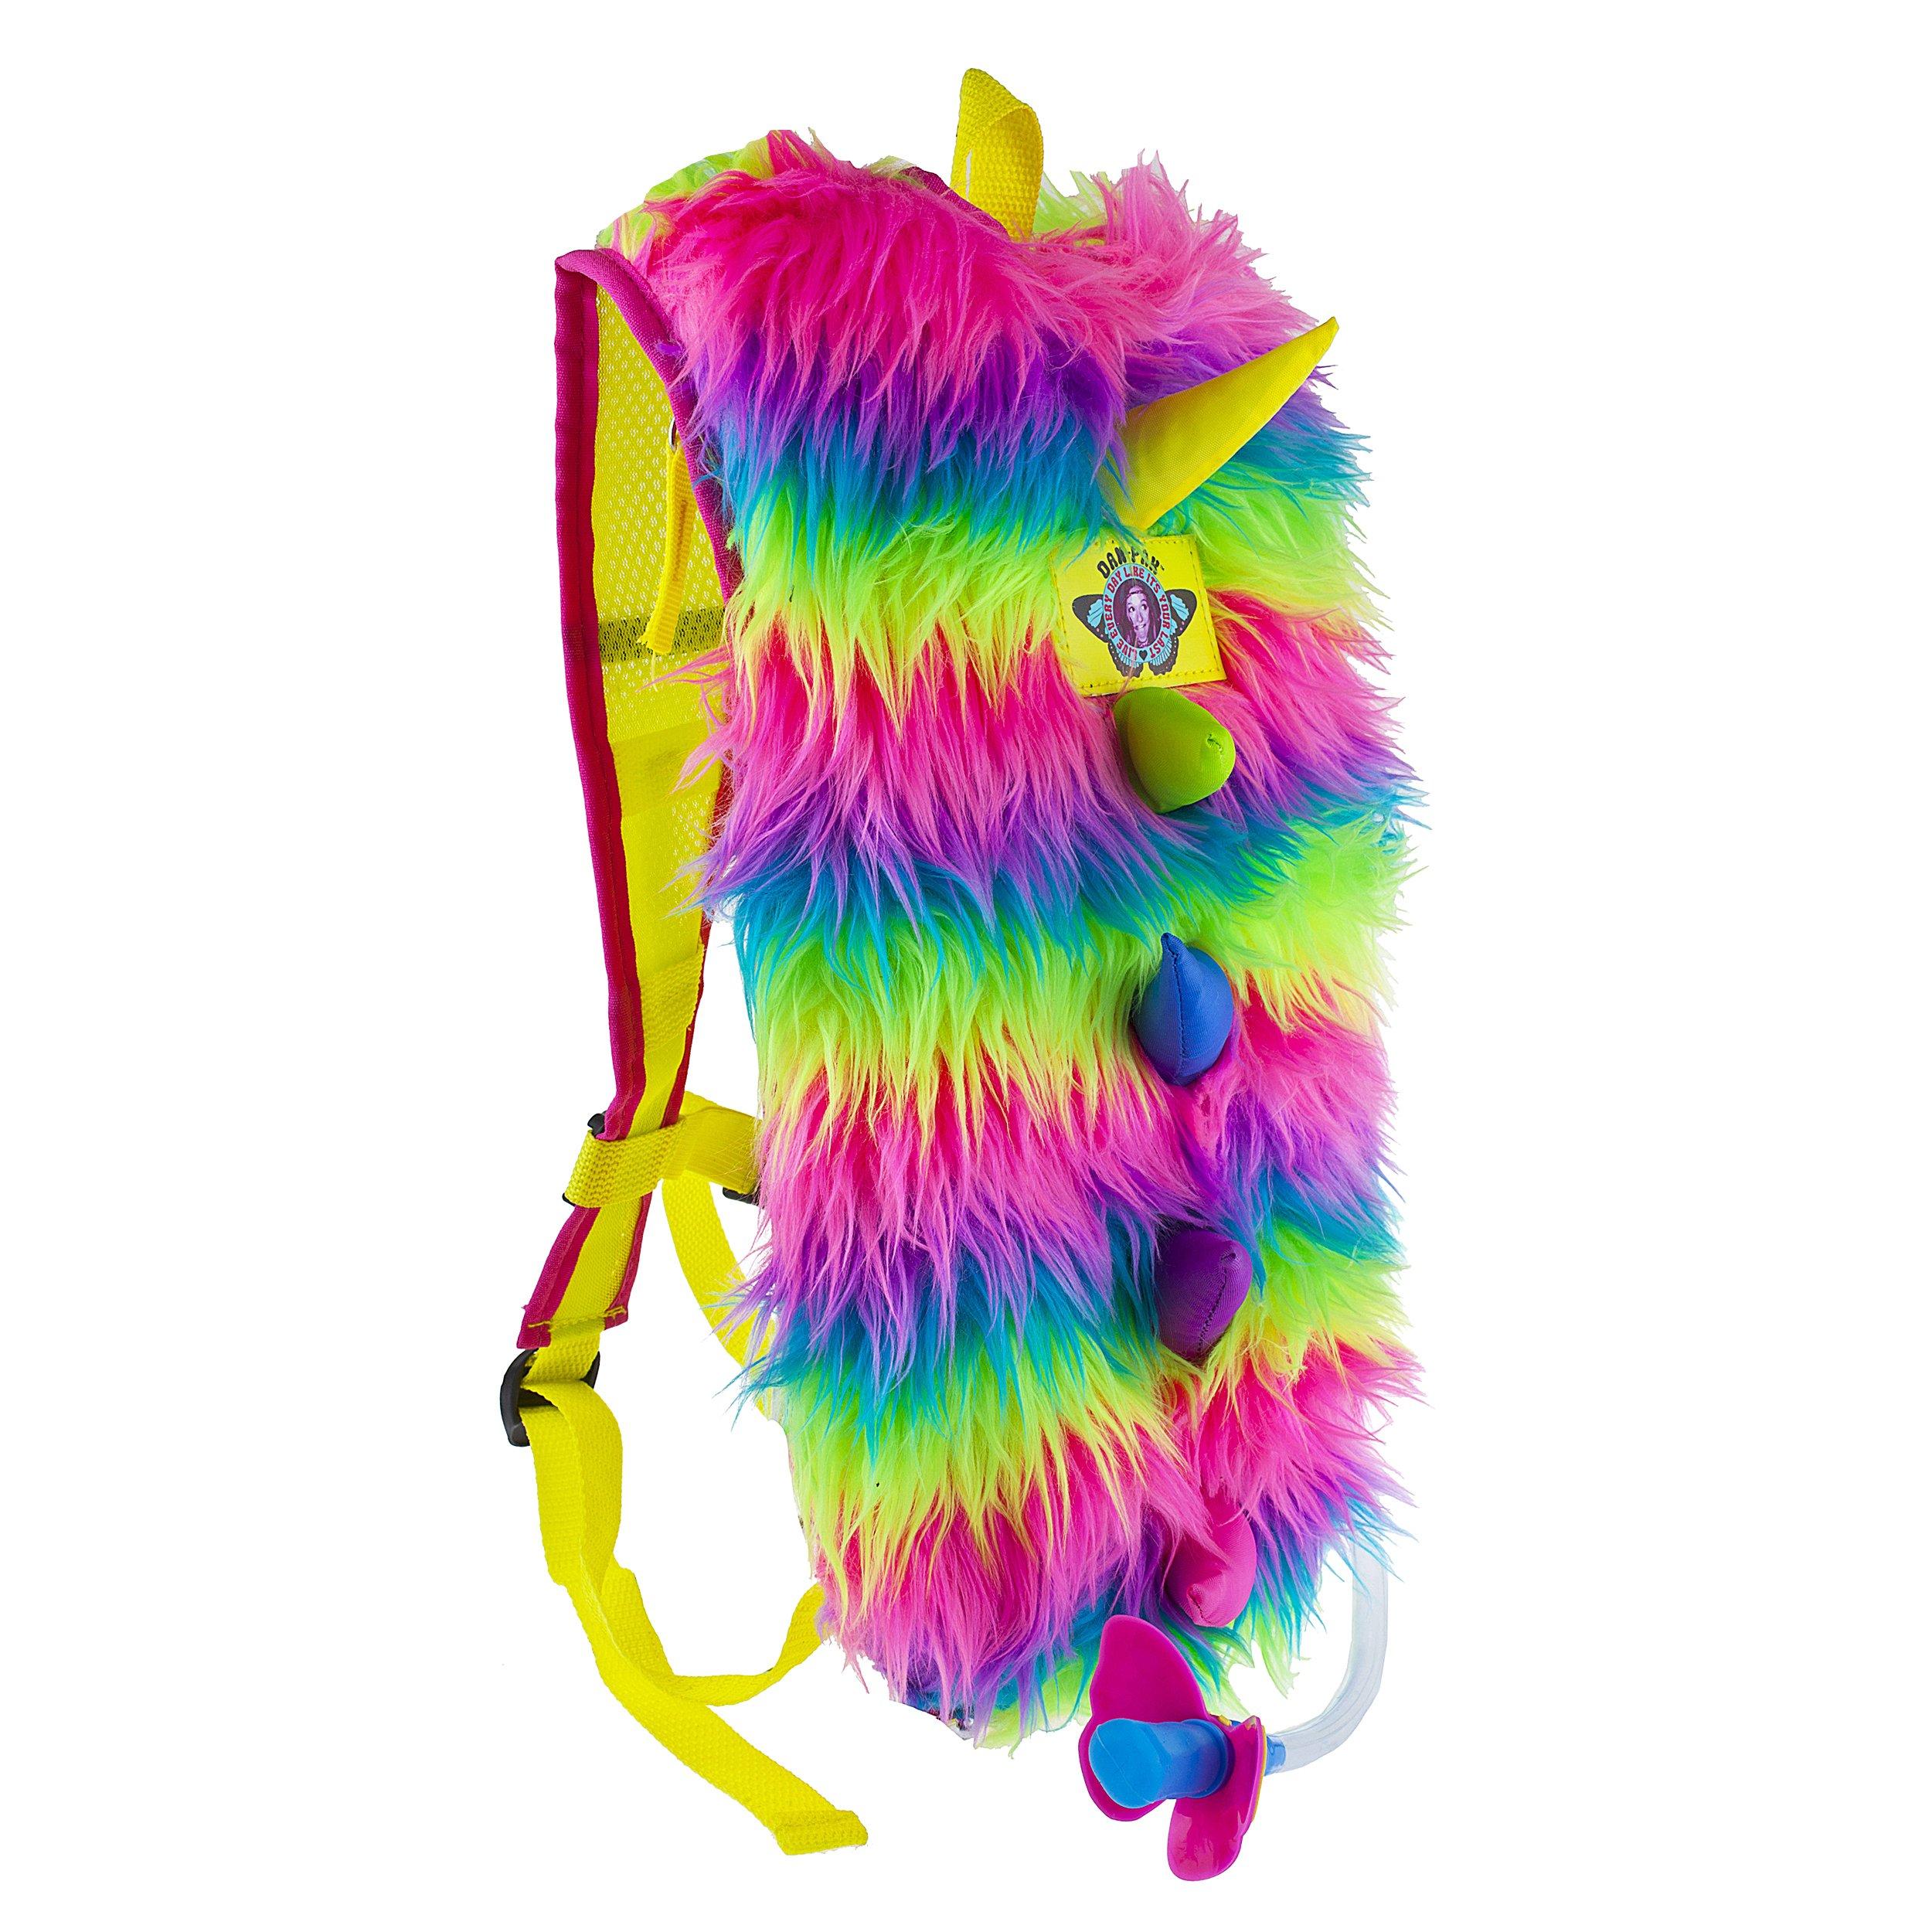 Dan-Pak Hydration Pack - Furry Monster